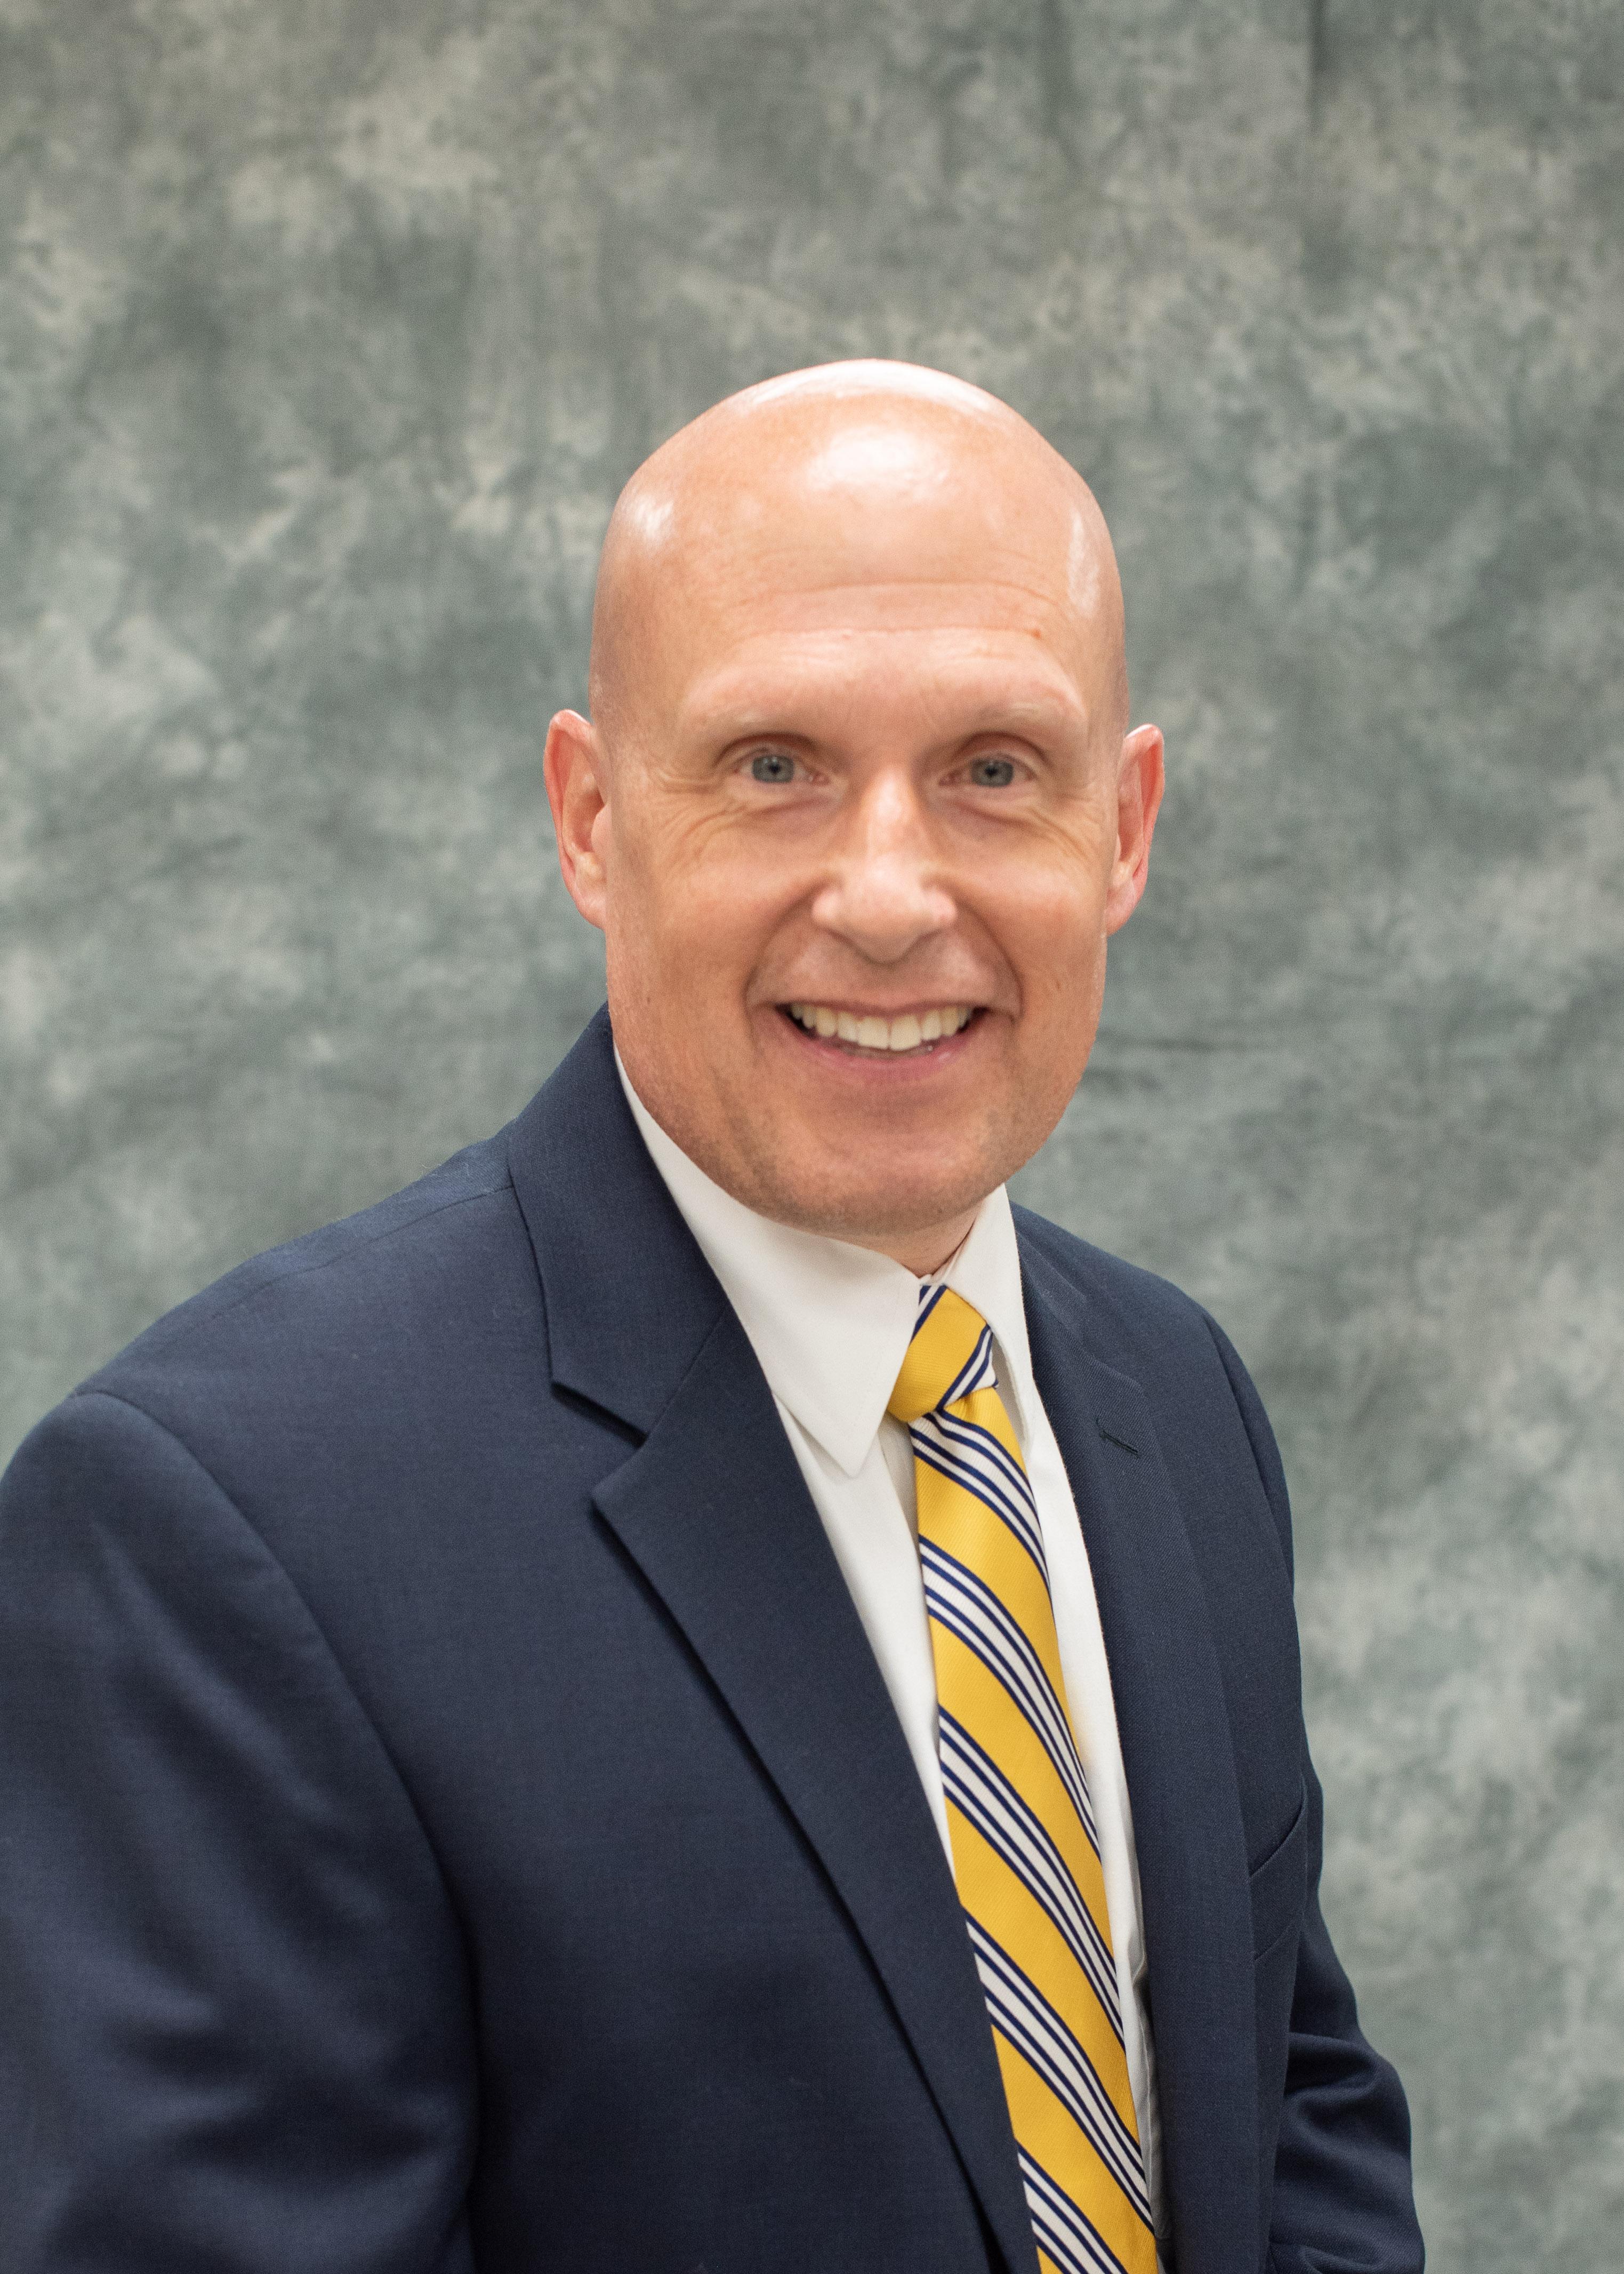 A photo of Doug Ackermann, Treasurer.